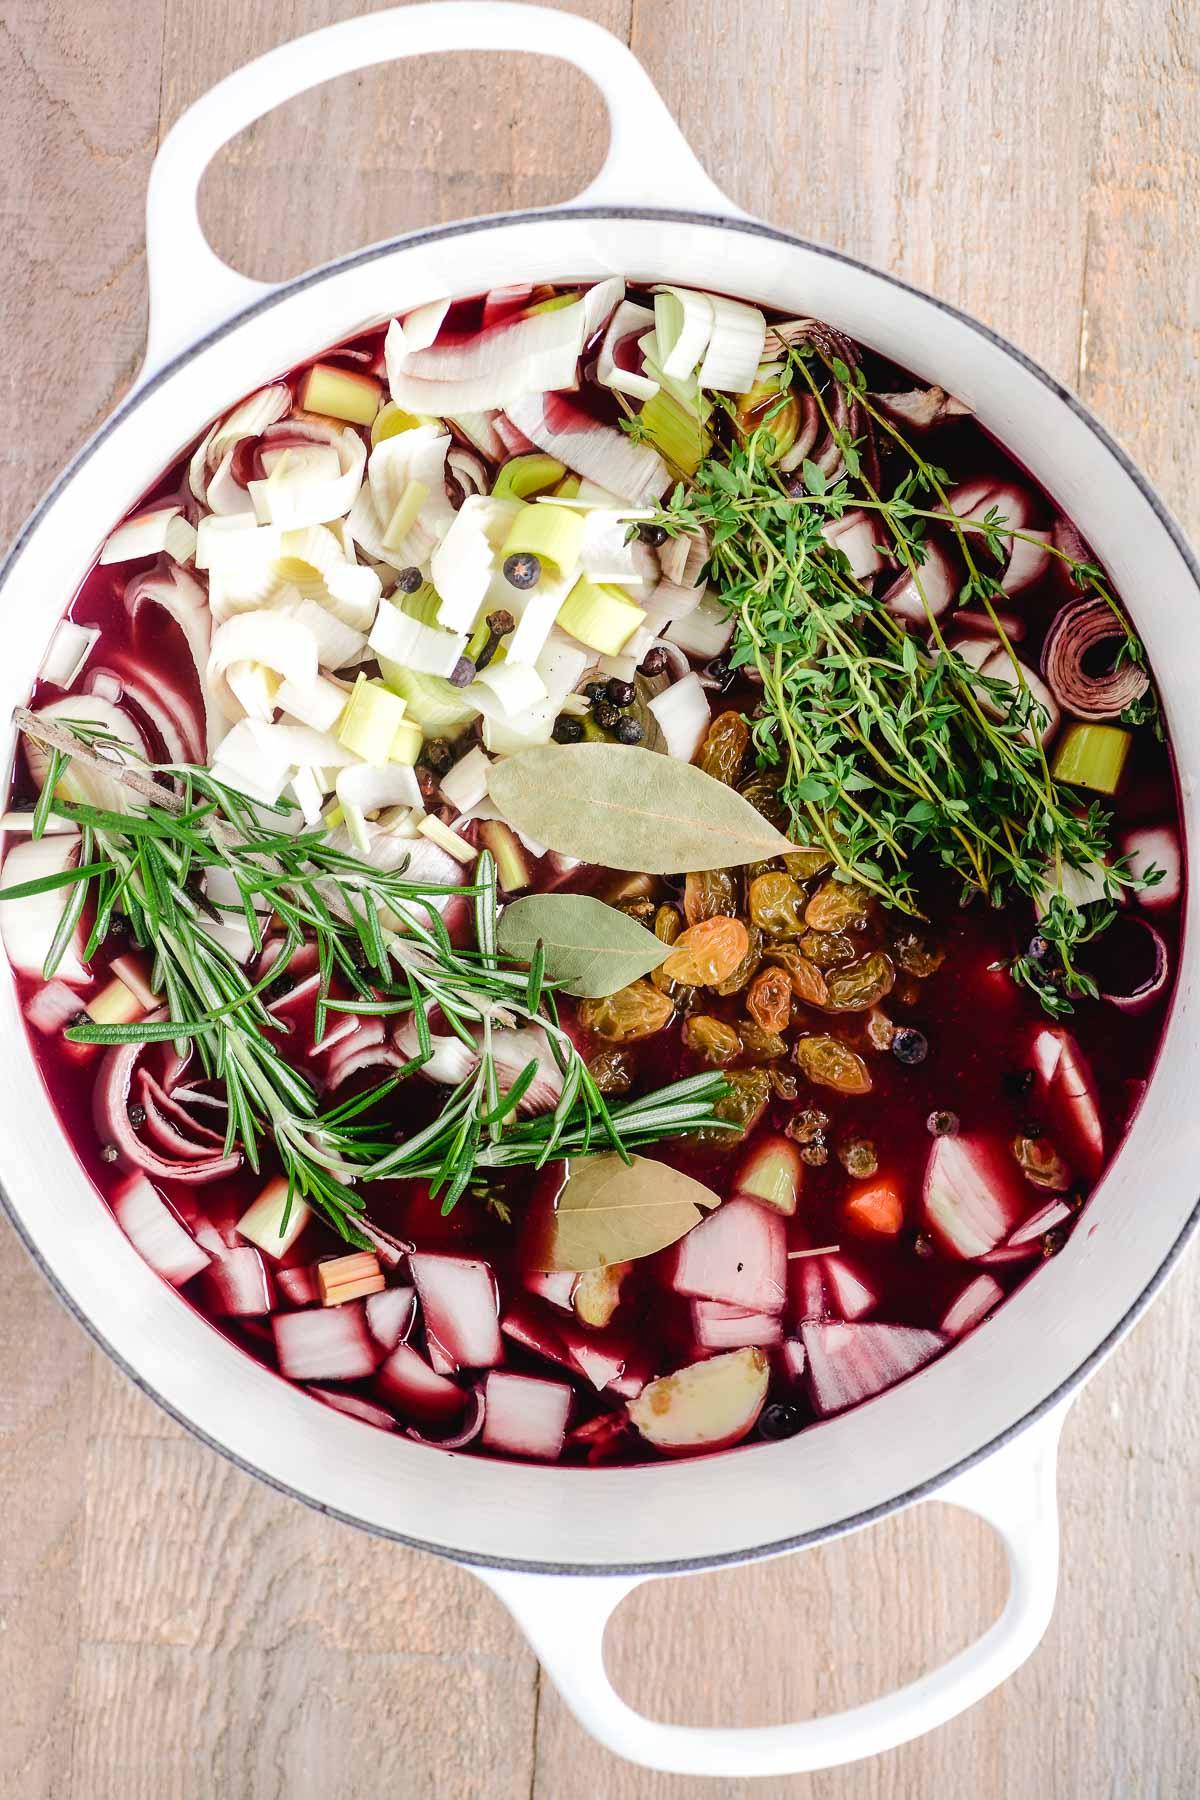 traditional marinade for German sauerbraten pot roast